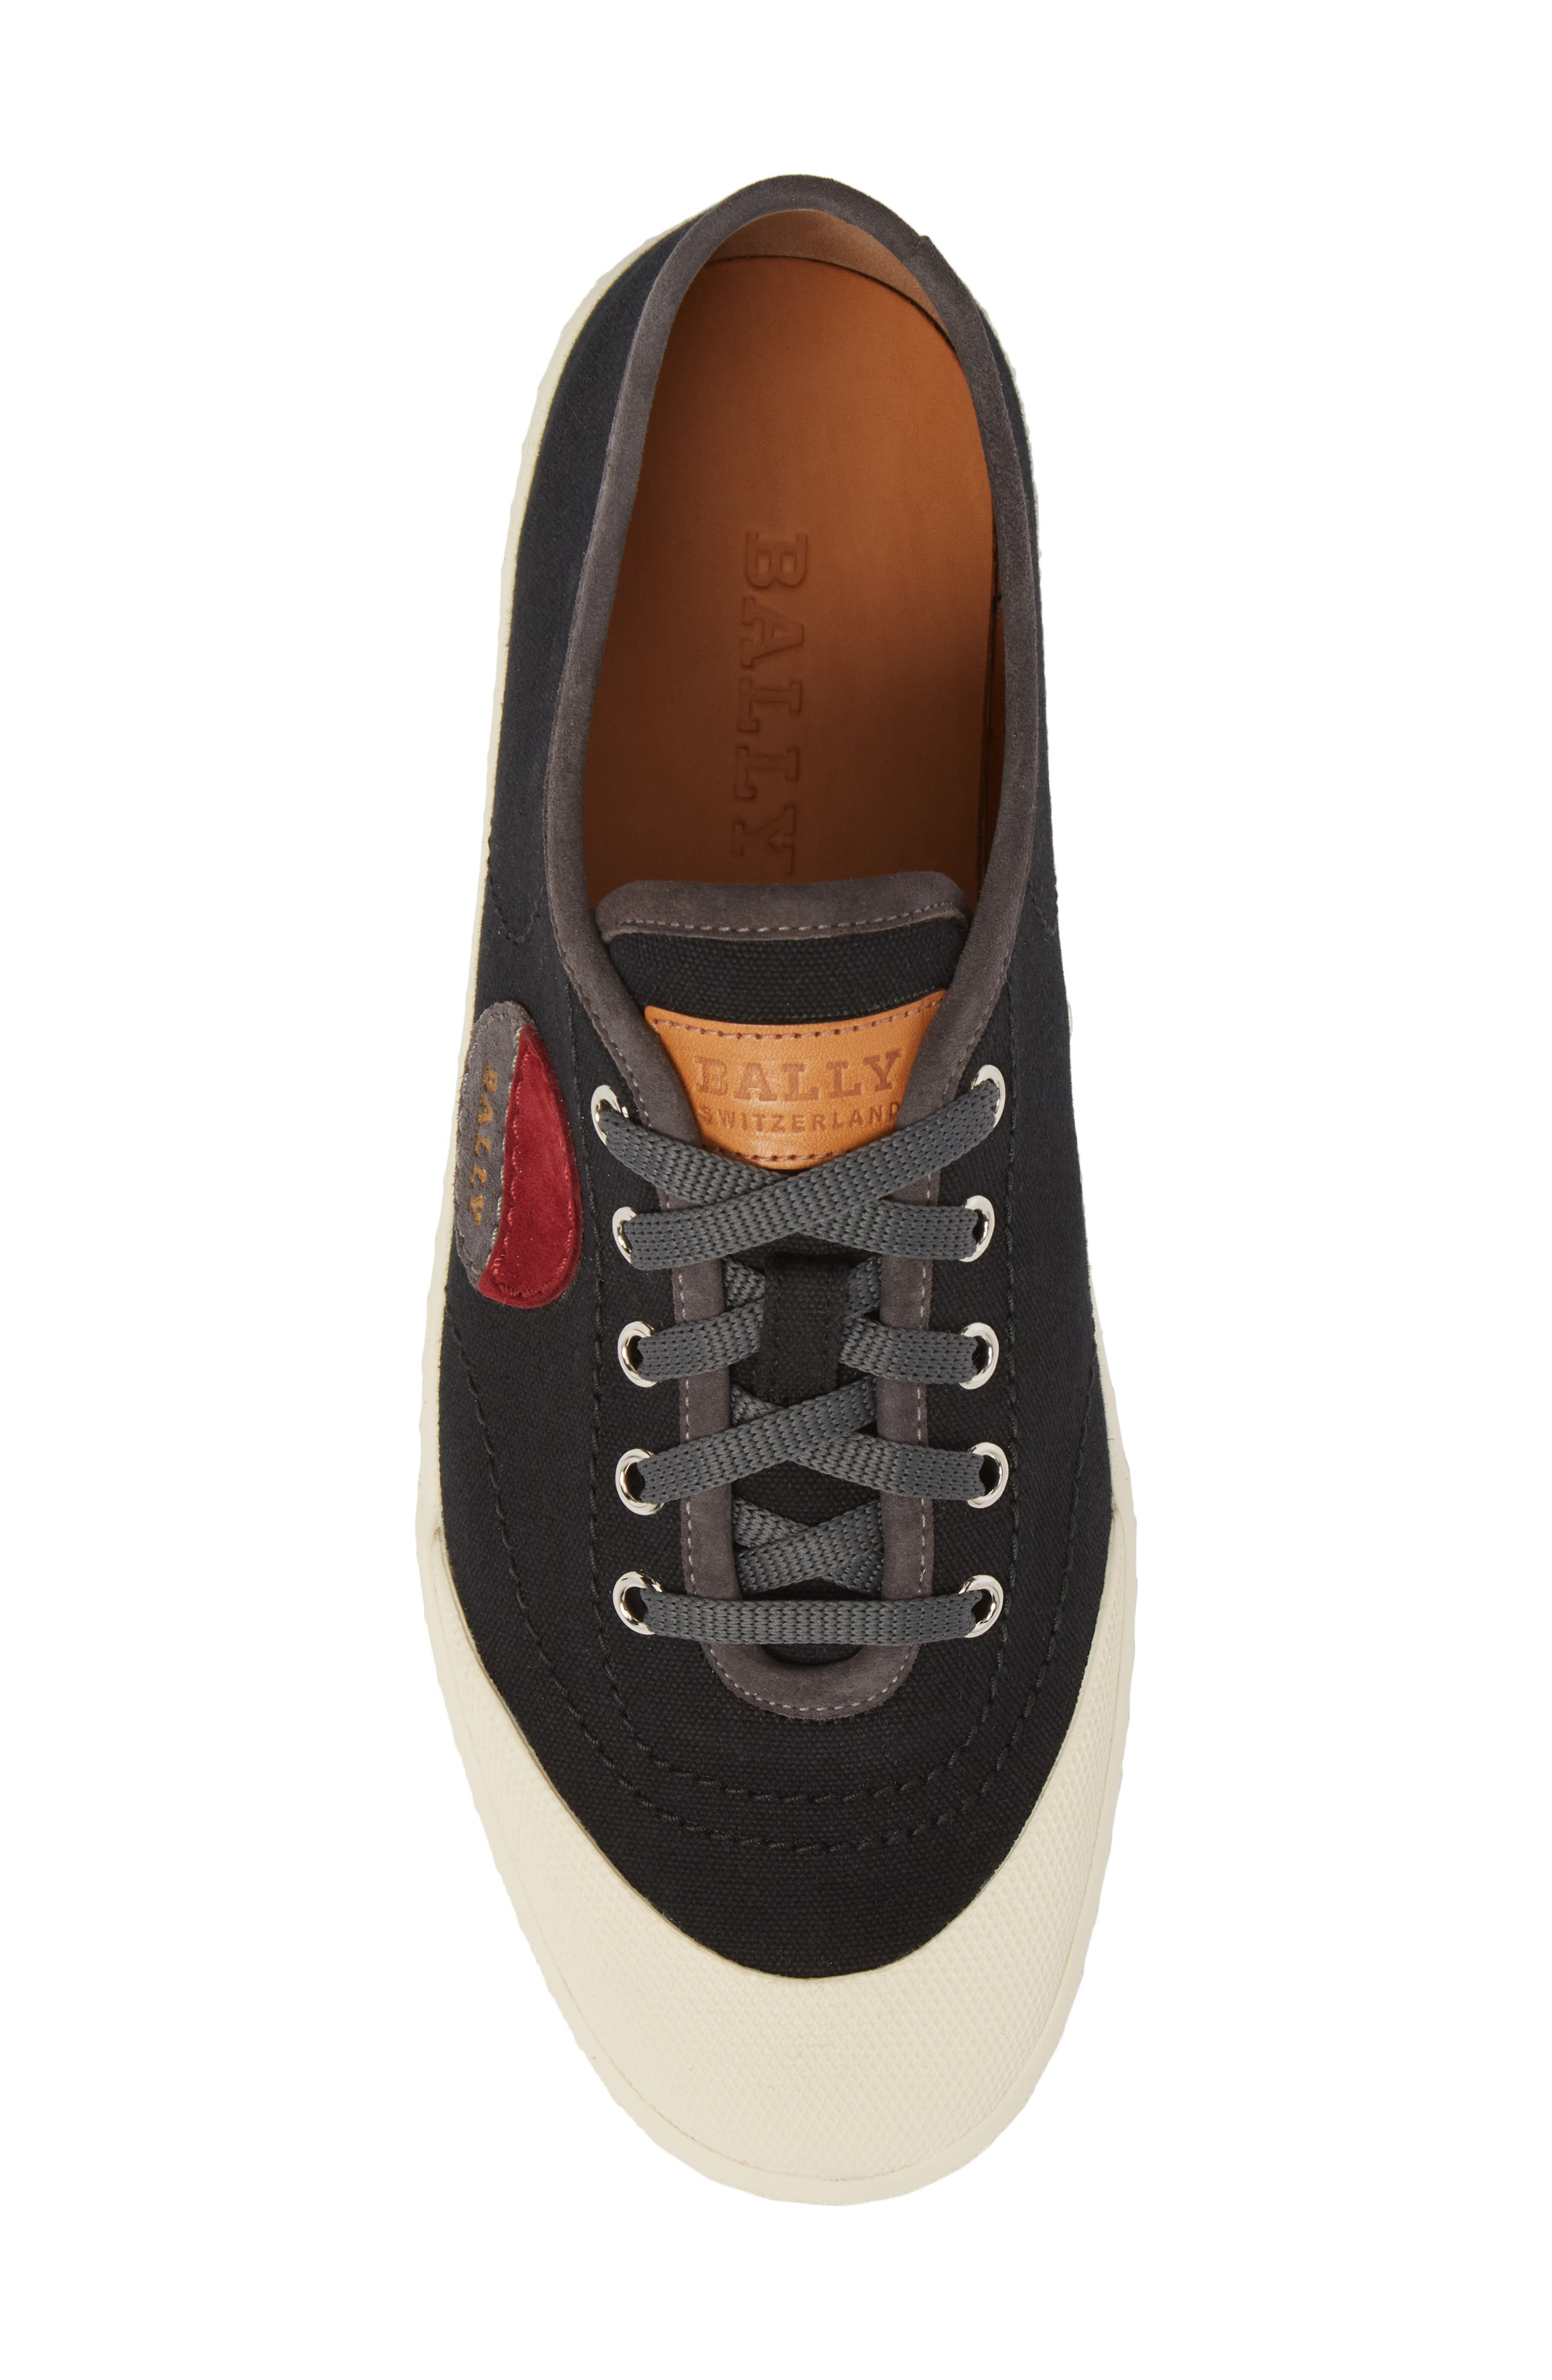 Silio Low Top Sneaker,                             Alternate thumbnail 5, color,                             001